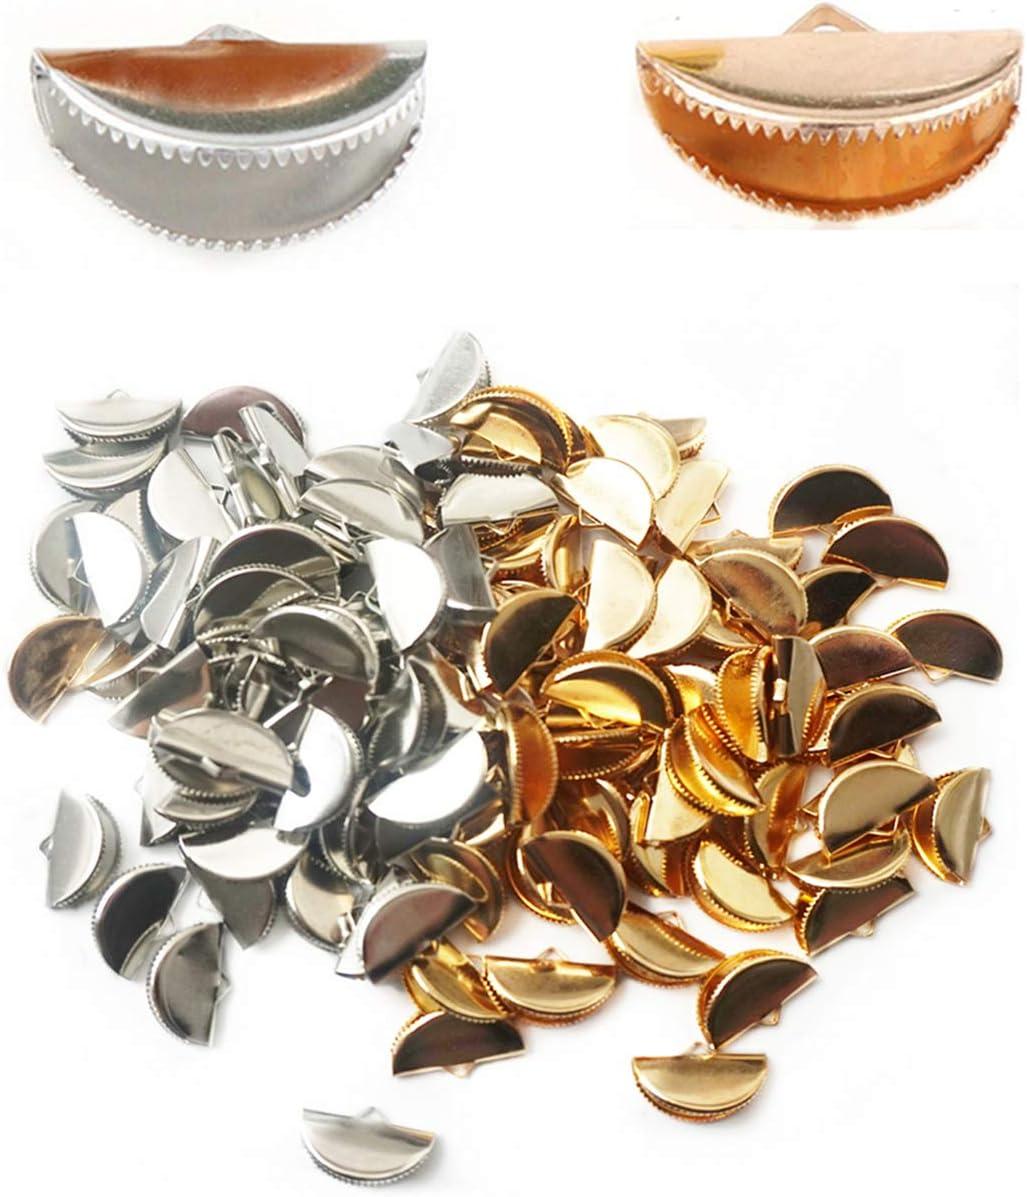 Xinhongo 120 Pcs Silver quality assurance Gold Half Sale Special Price B Crimps Ribbon Round End Cord